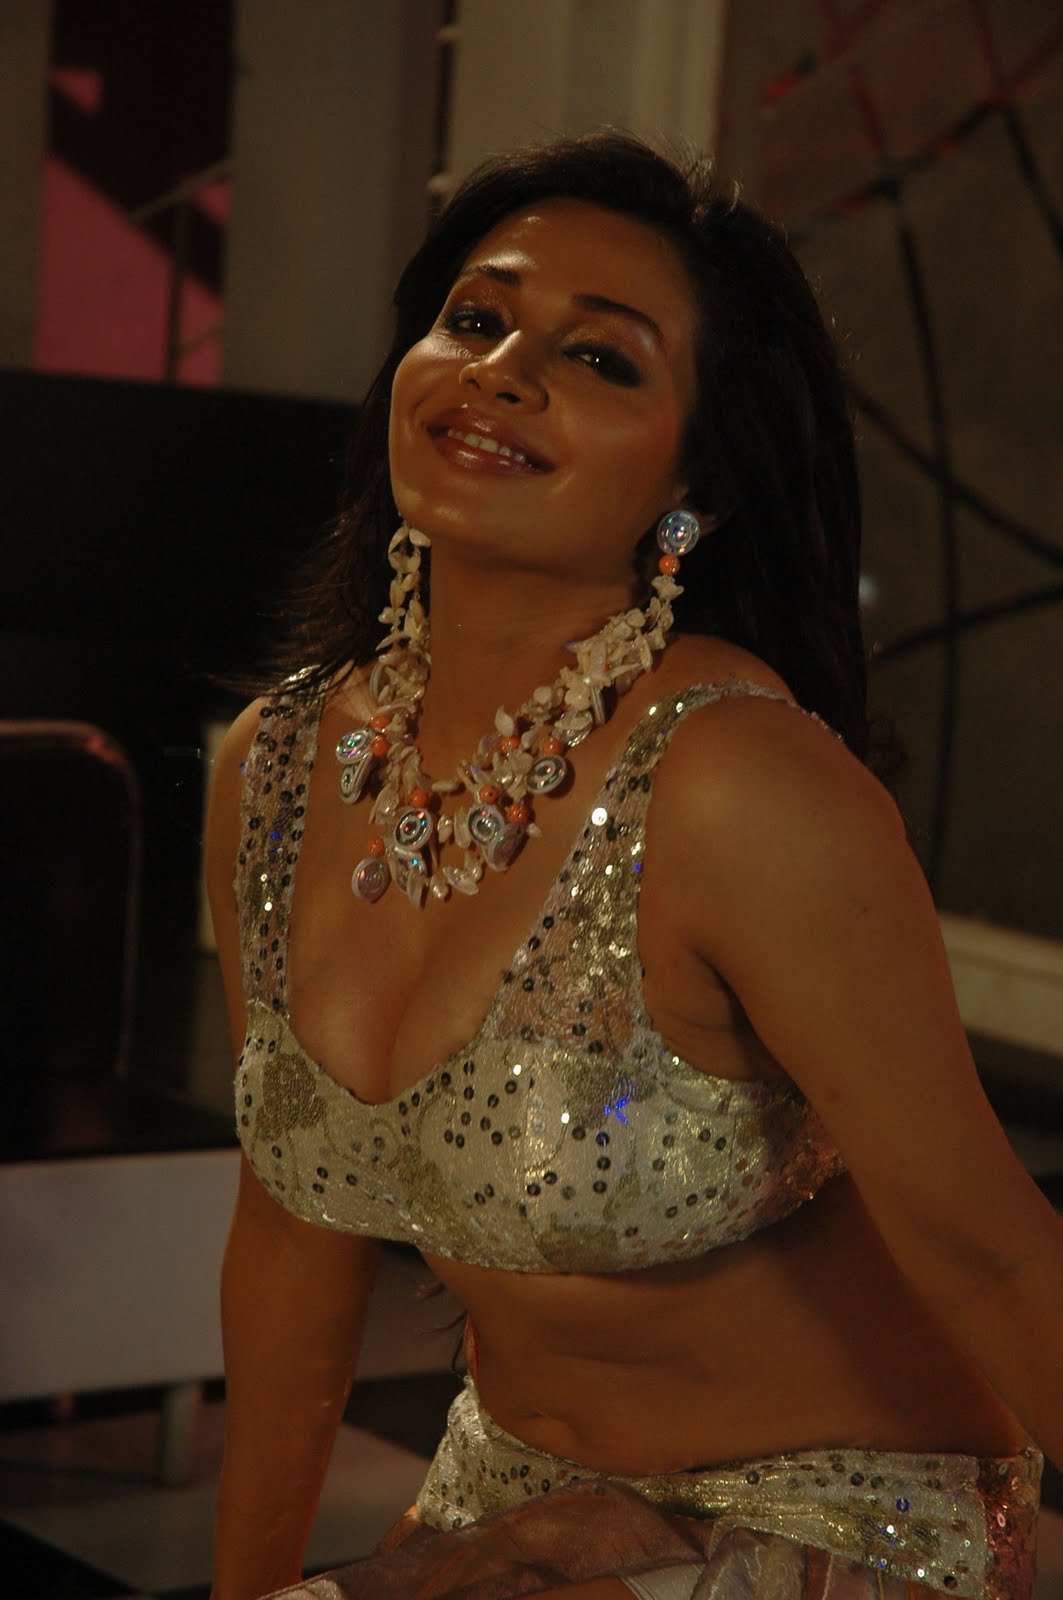 Desi bhabhi rekha sharma hot married fucking with boss - 3 2